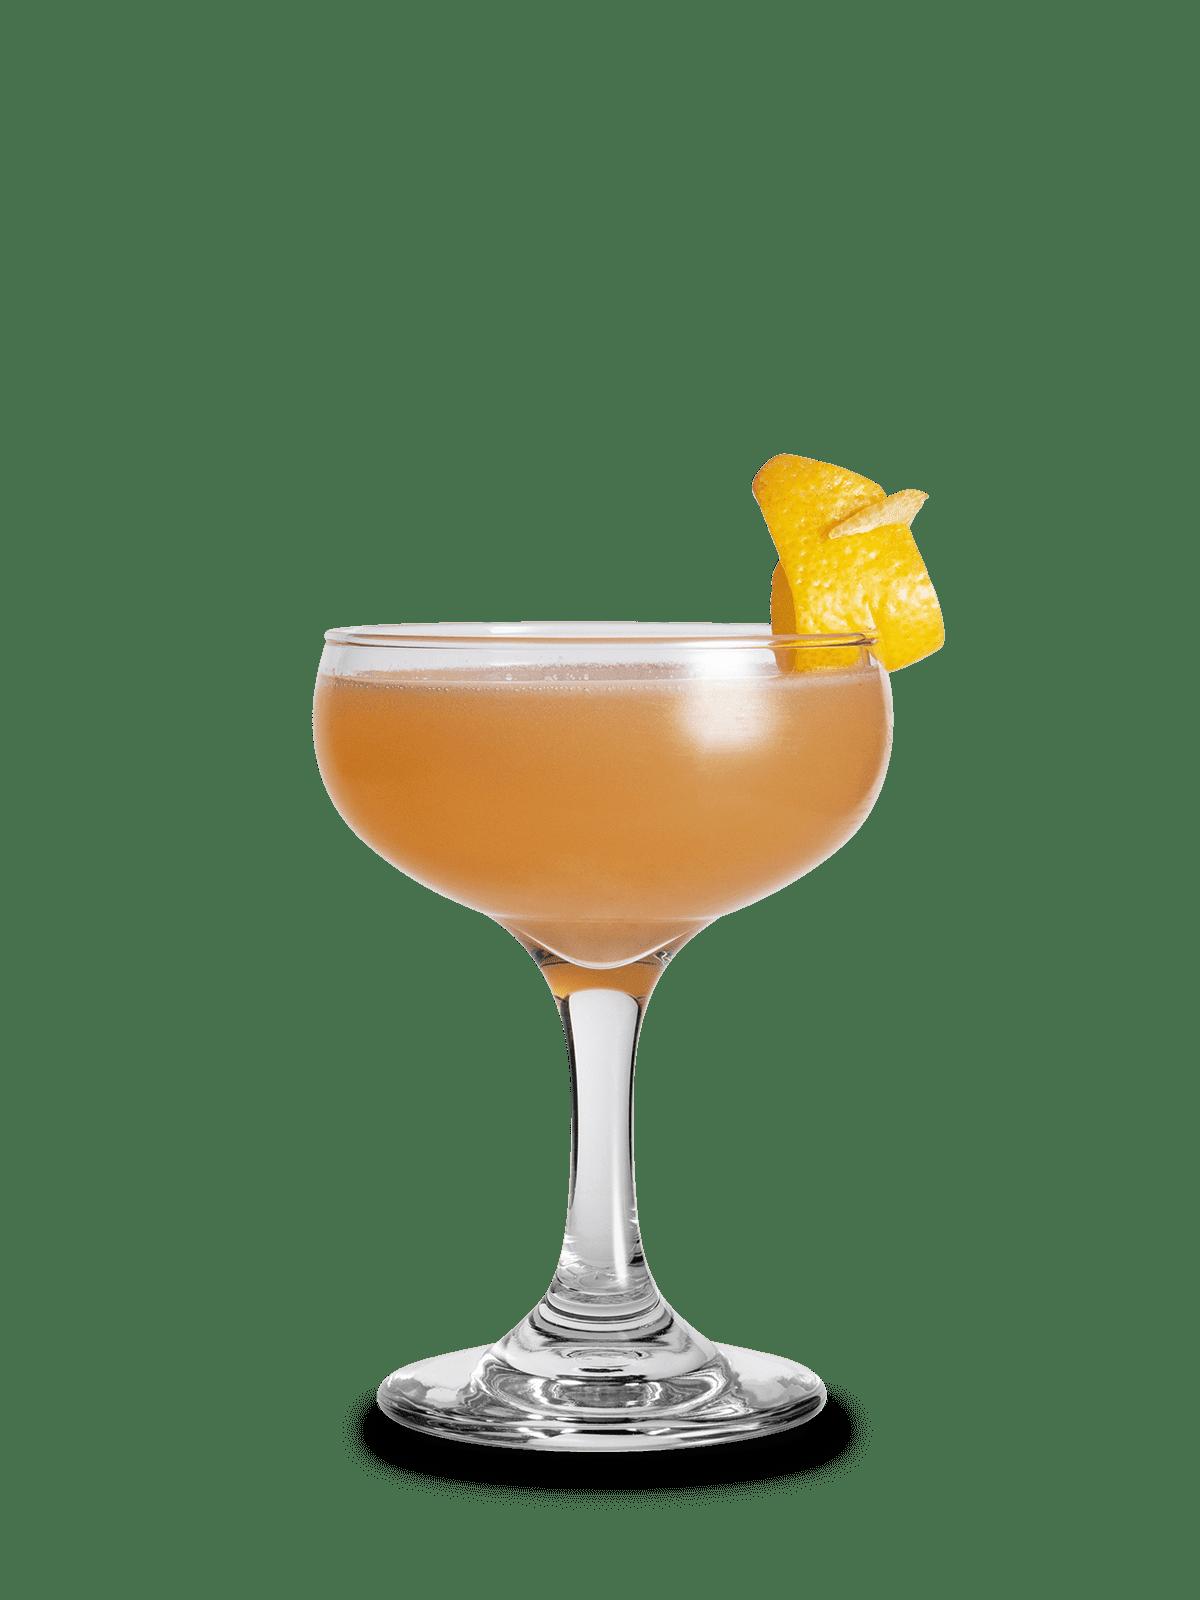 Gin Cocktail: Cedar Smoked Corpse Reviver No. 2